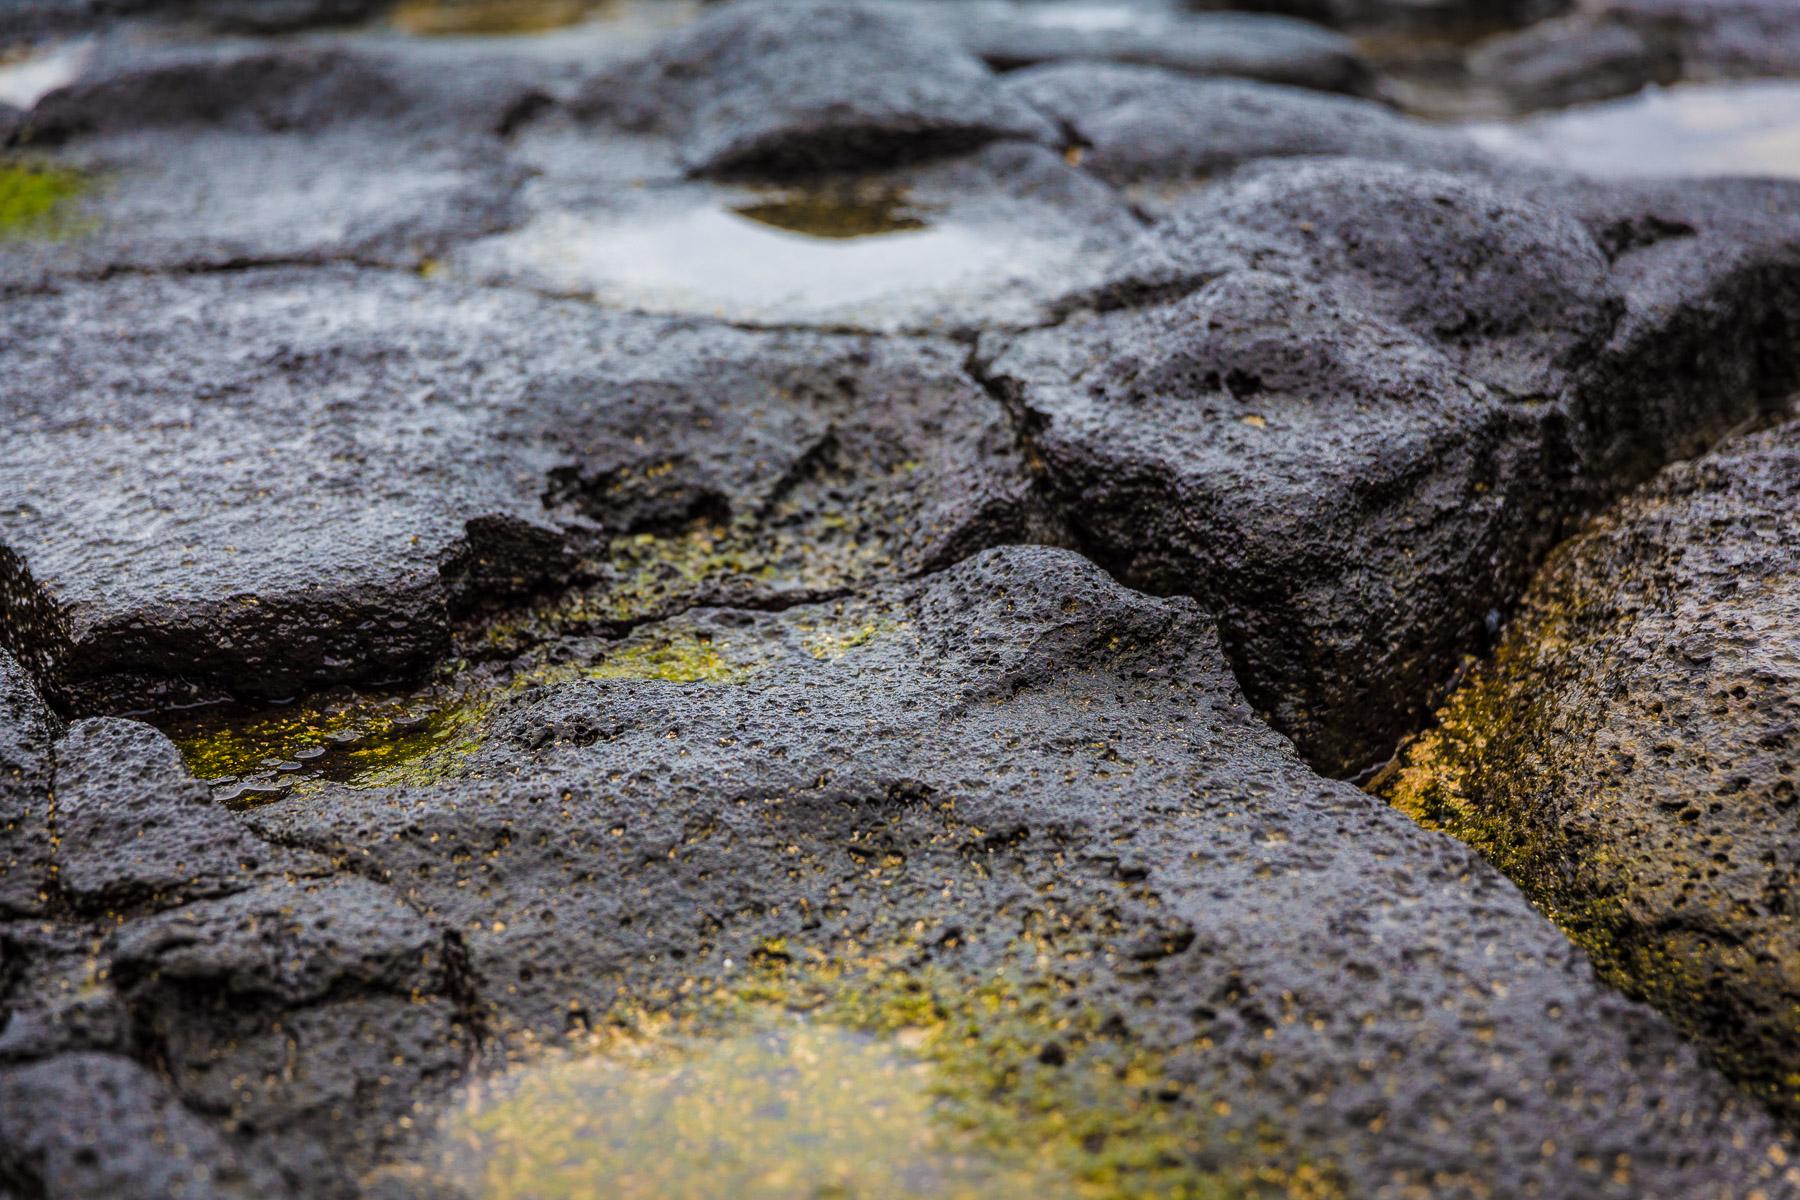 texture-macro-photography-volcanic-rocks-kapaa-beach-kauai.jpg